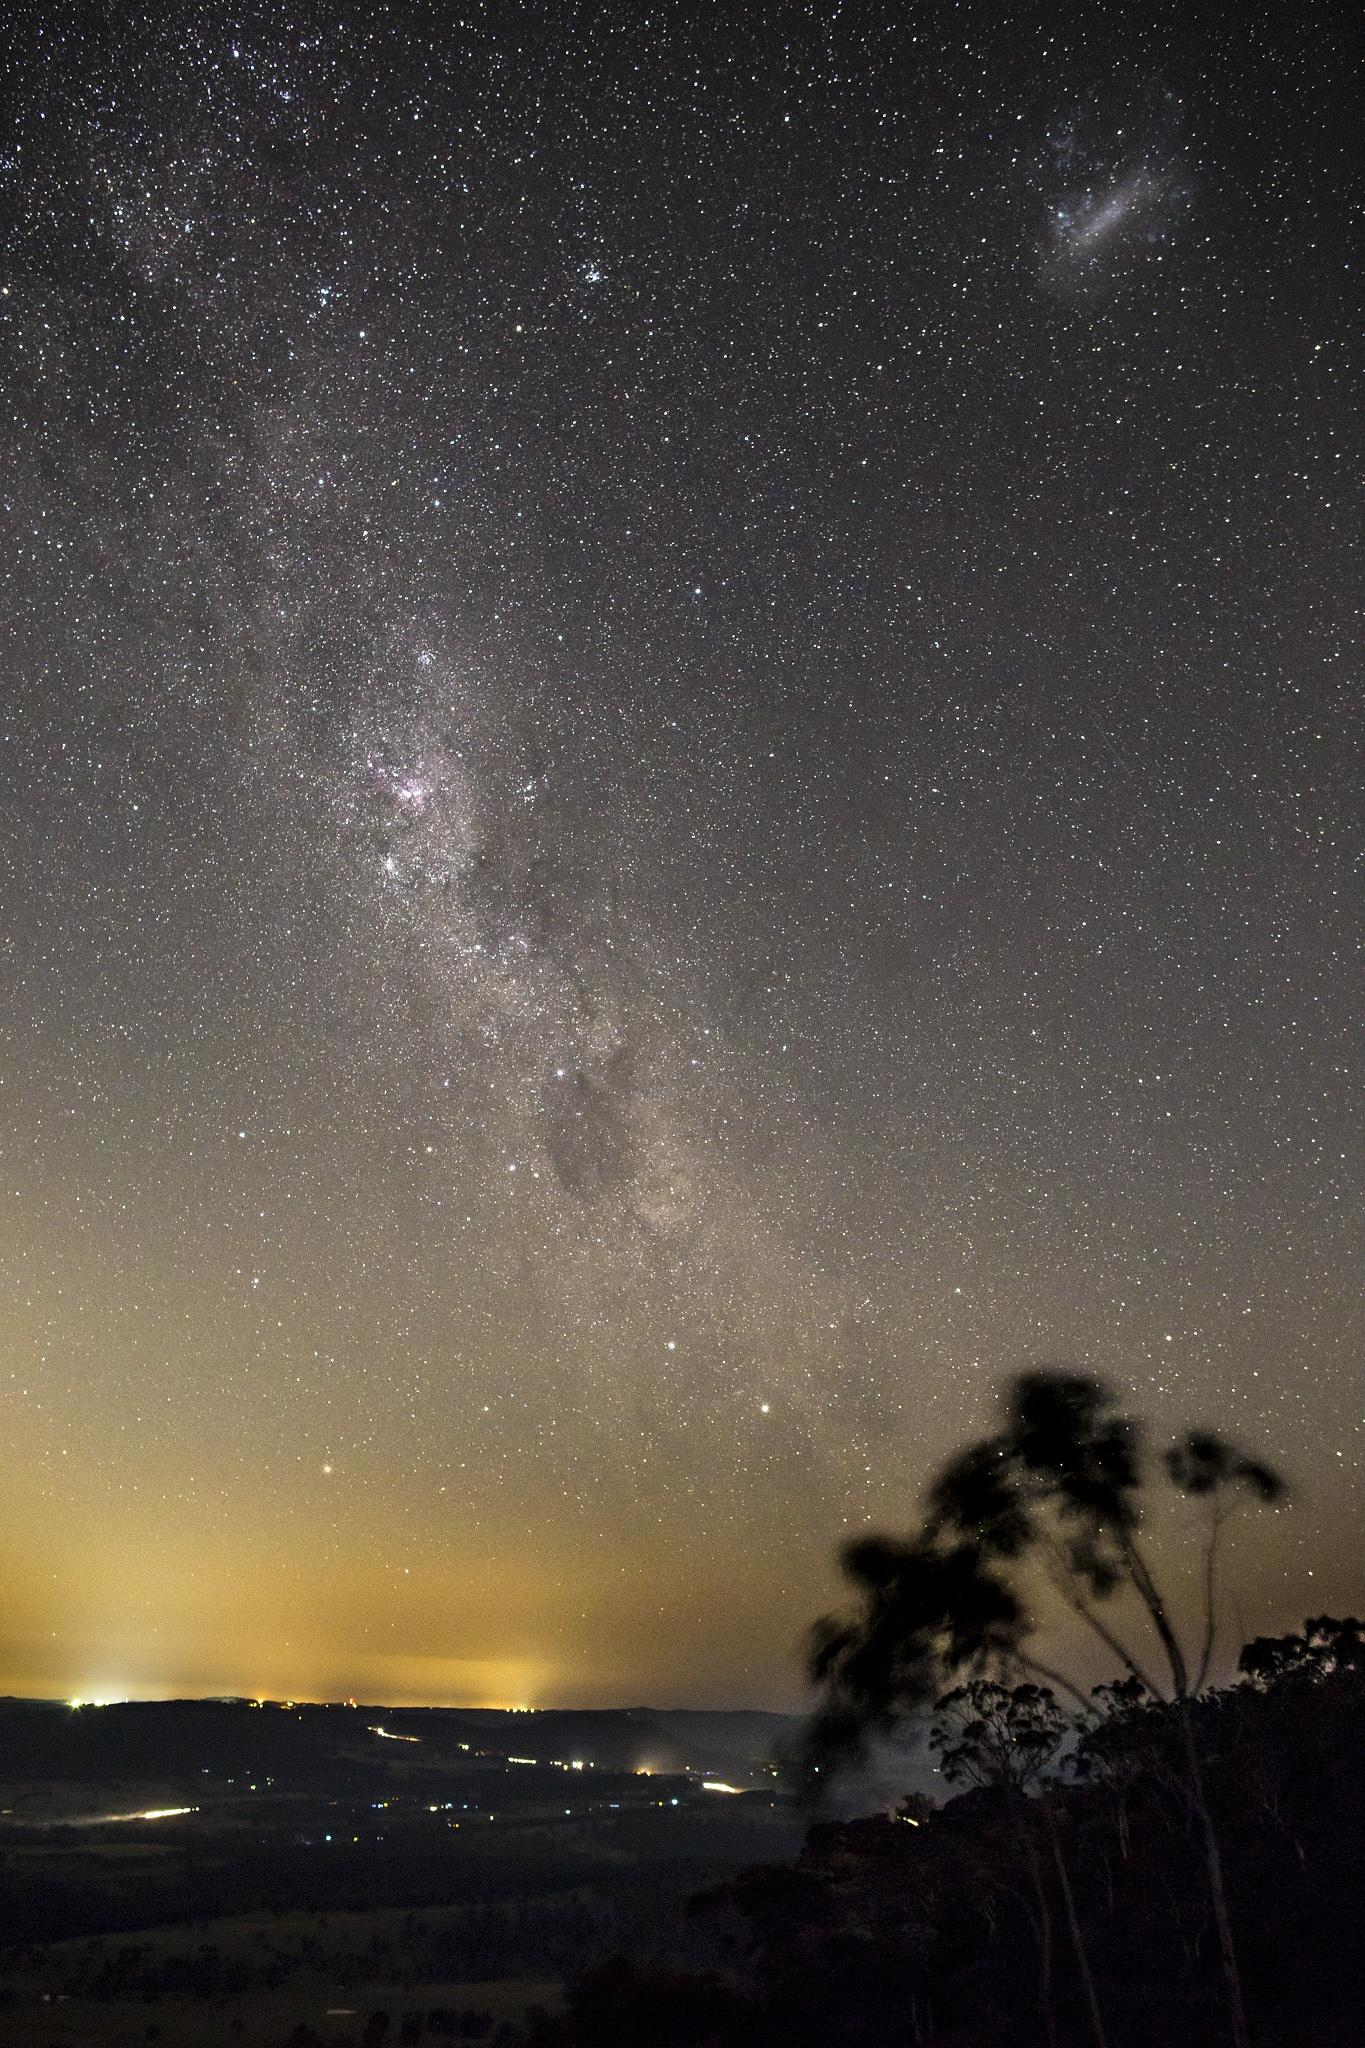 Starry Starry Night 2 by Doc Jones